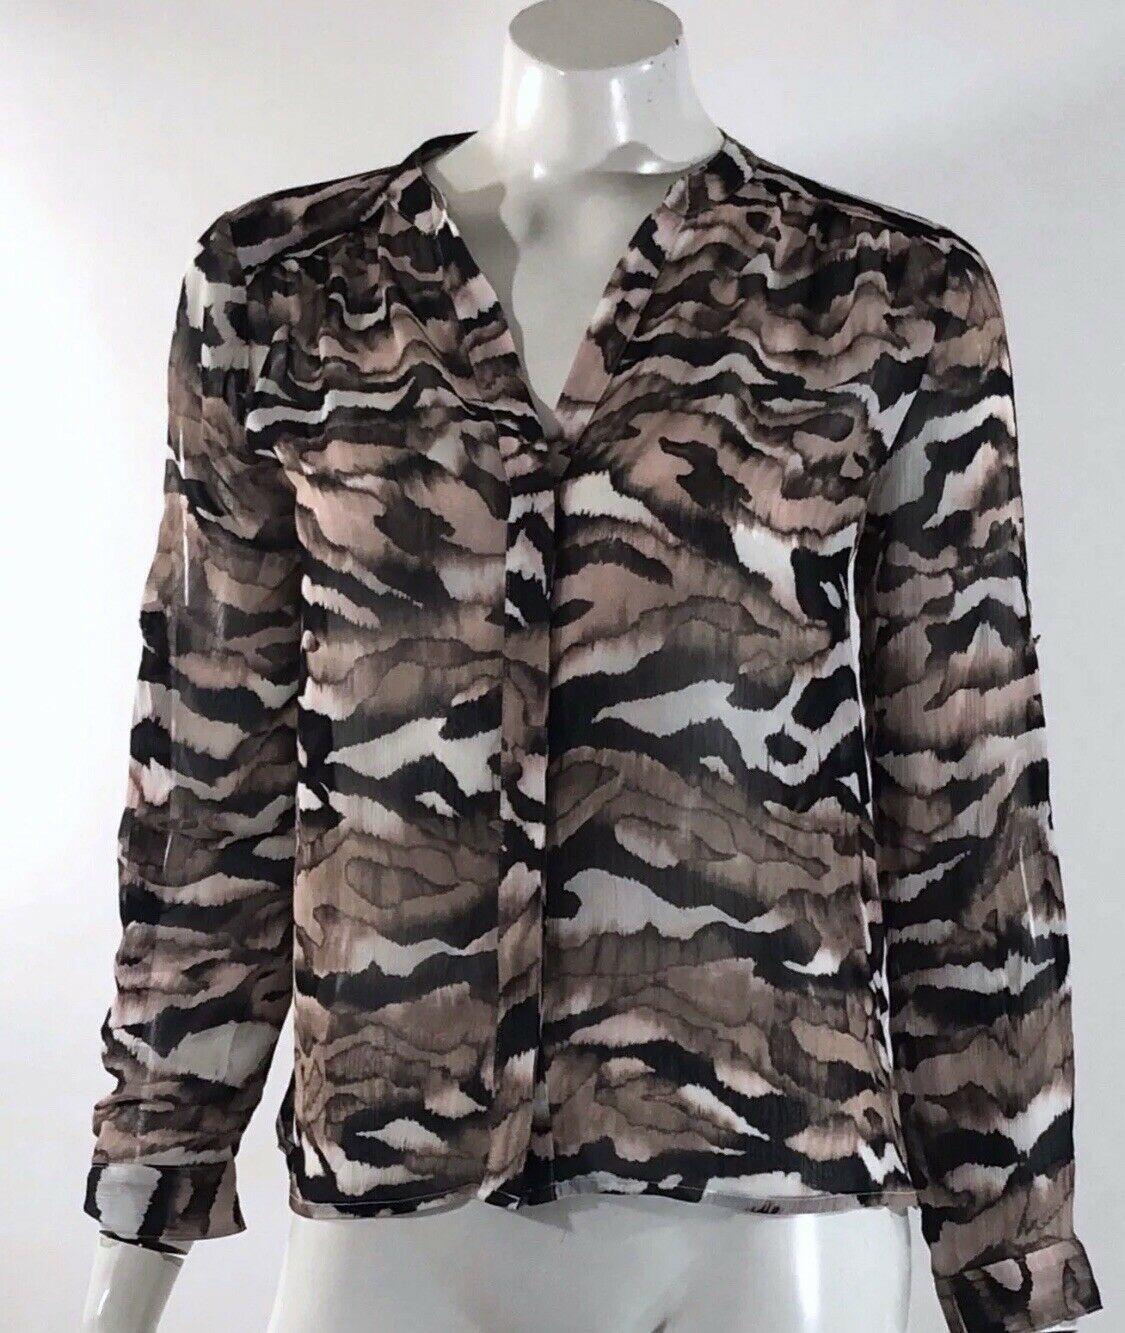 Jennifer Lopez Womens Top Size XS Brown Pink Blouse Sheer Open Back Blouse - $4.91